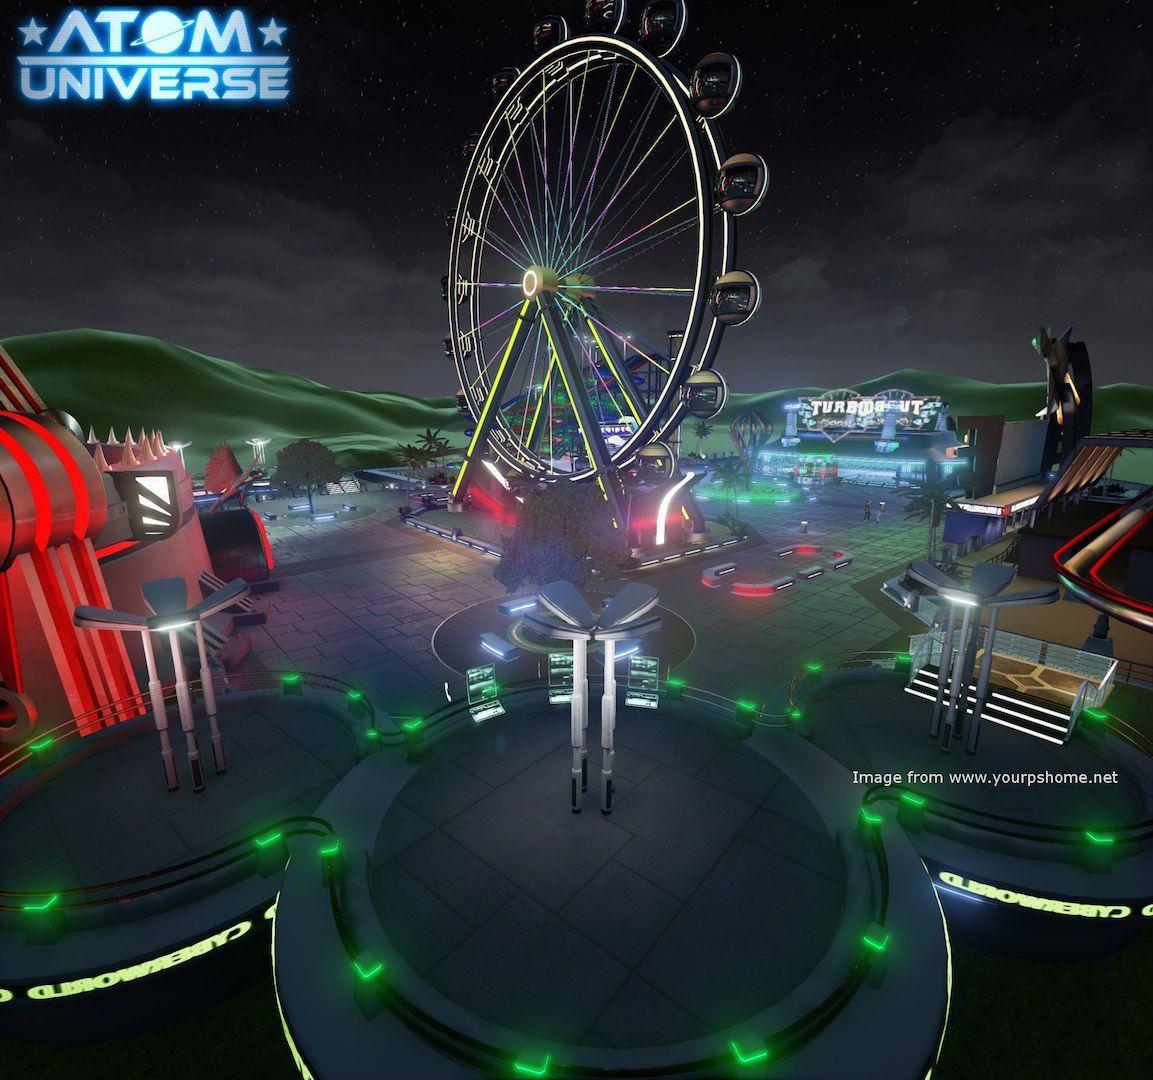 Karen Talks To Atom Republic About Atom Universe, kwoman32, Nov 30, 2014, 4:55 PM, YourPSHome.net, jpg, BirdsEyeView-copy.jpg